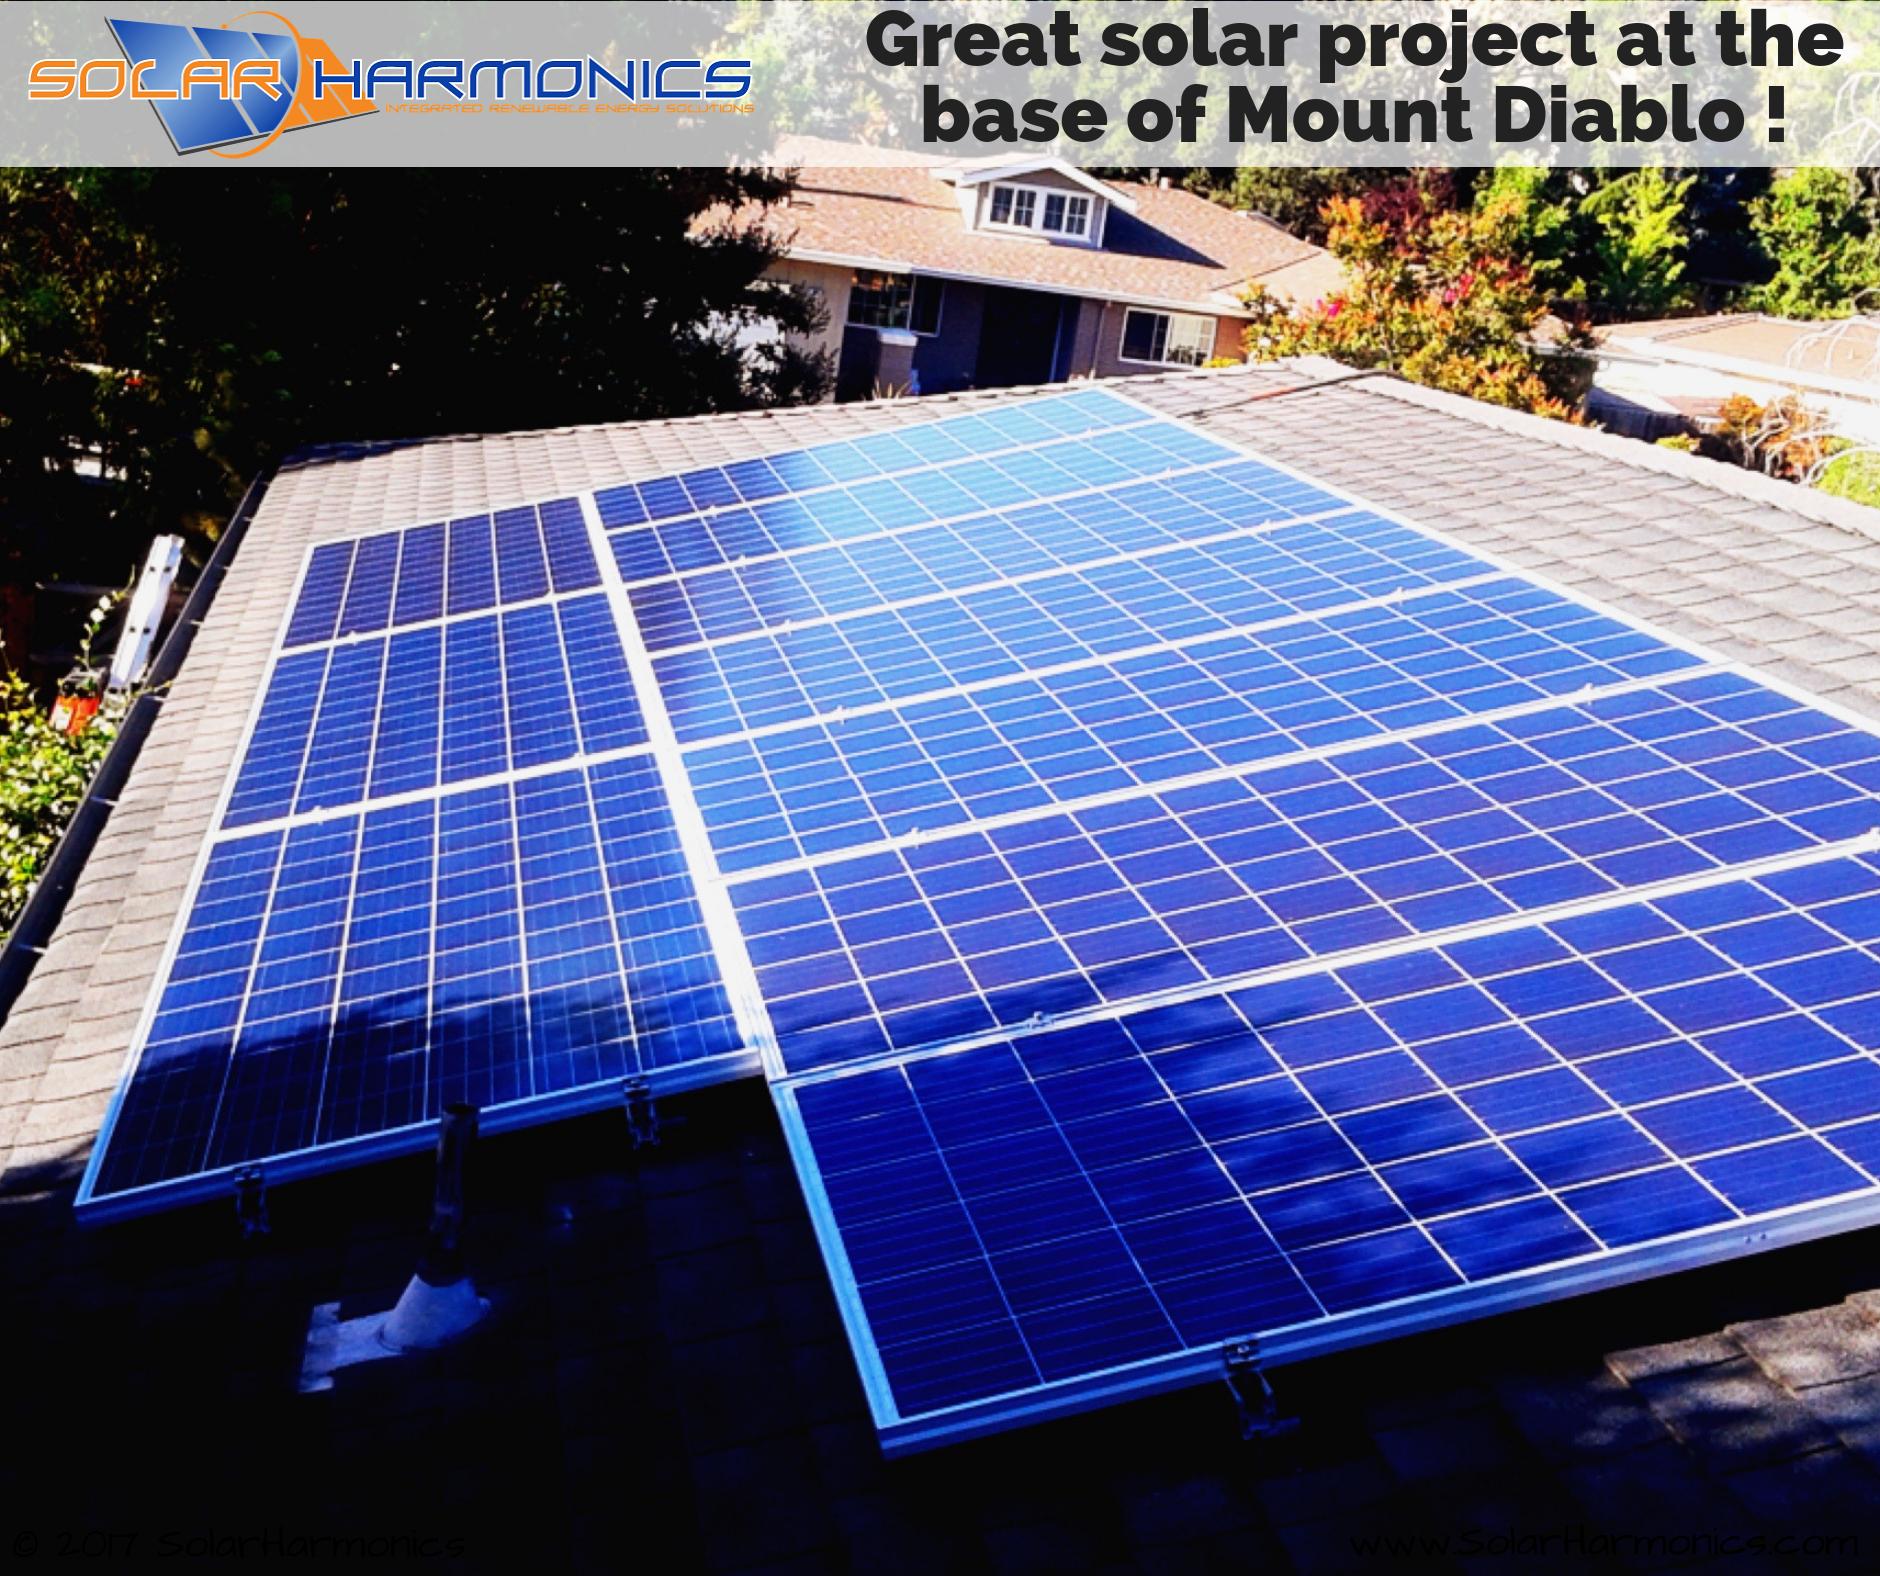 Solar_Harmonics_solar_installation_company_6001–6047-Heritage-Trail_Clayton_CA_United-States (2)